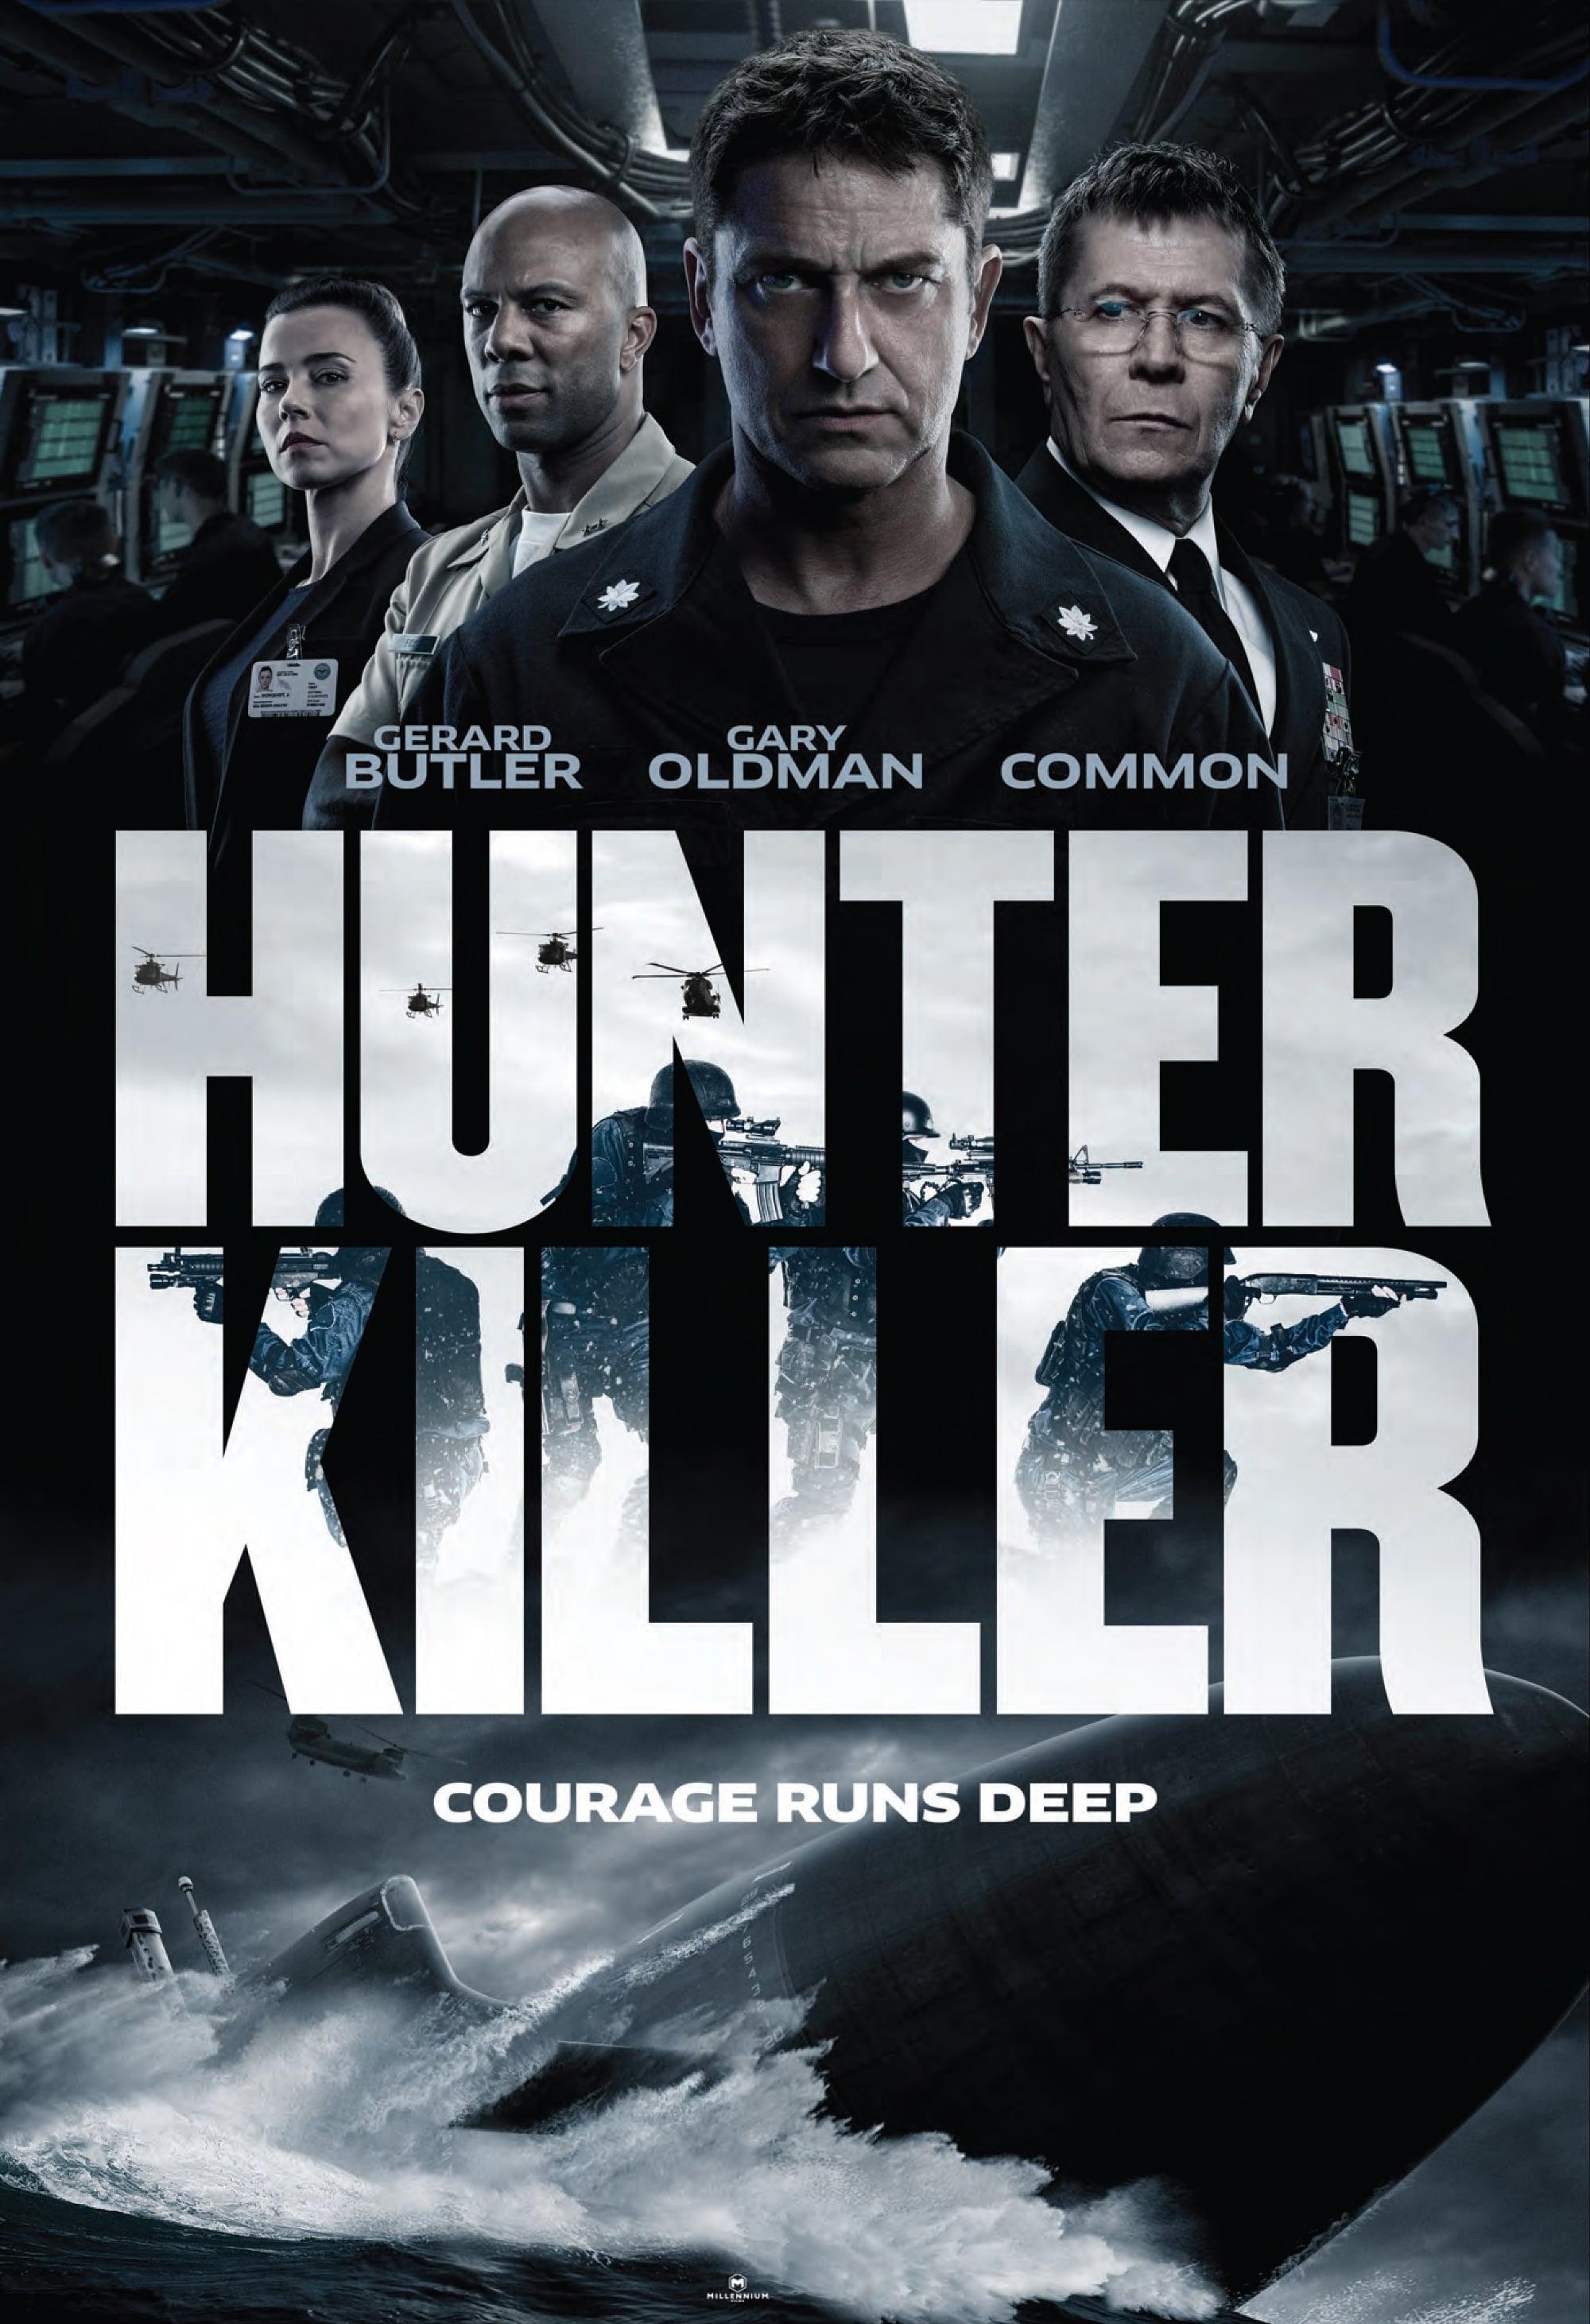 Poster and image movie Film Hunter Killer - Hunter Killer - Hunter Killer -  2017